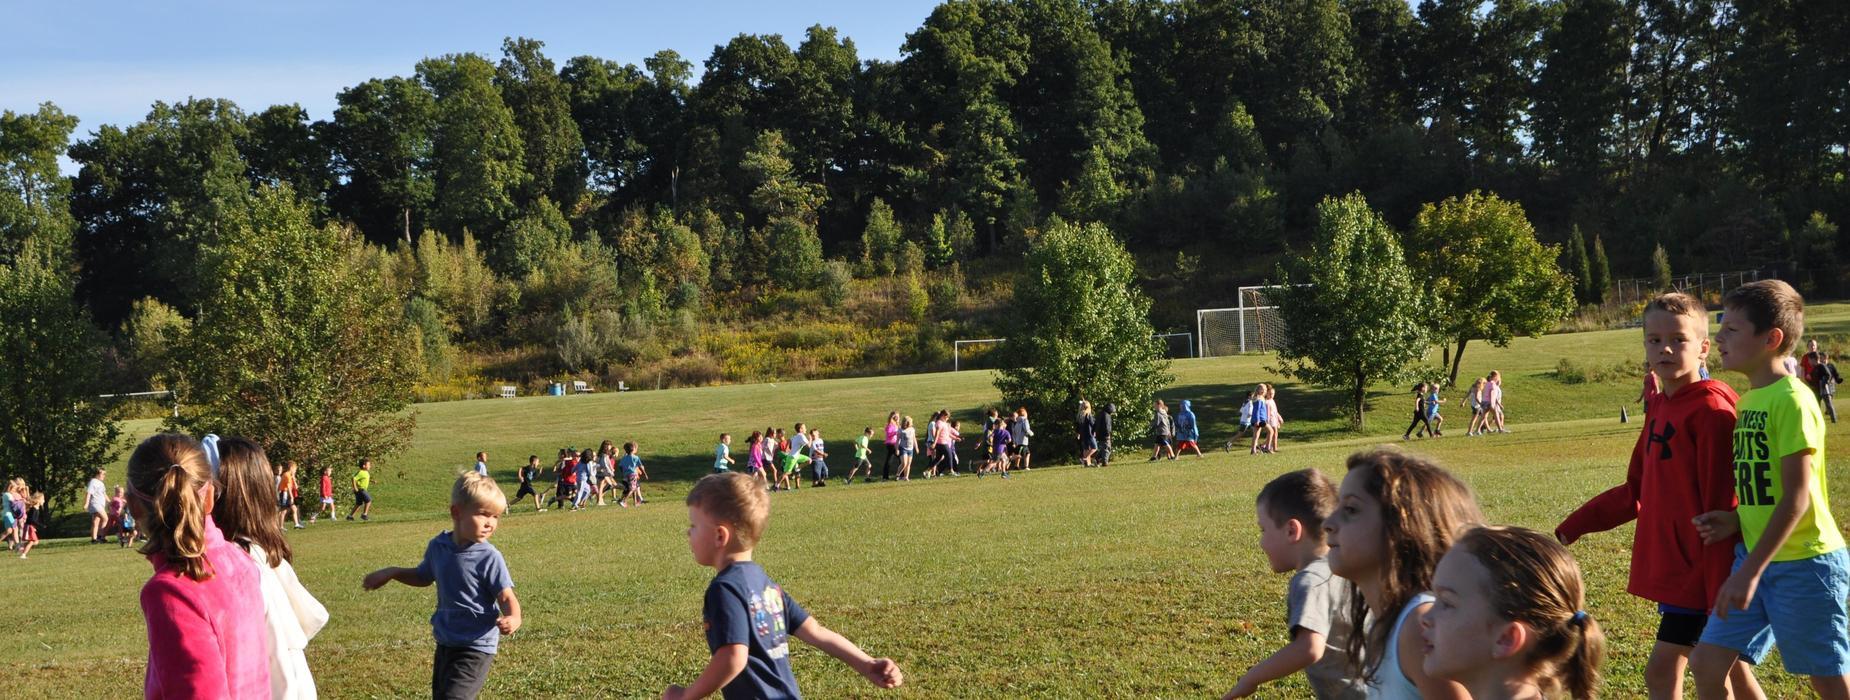 National Run at School Day